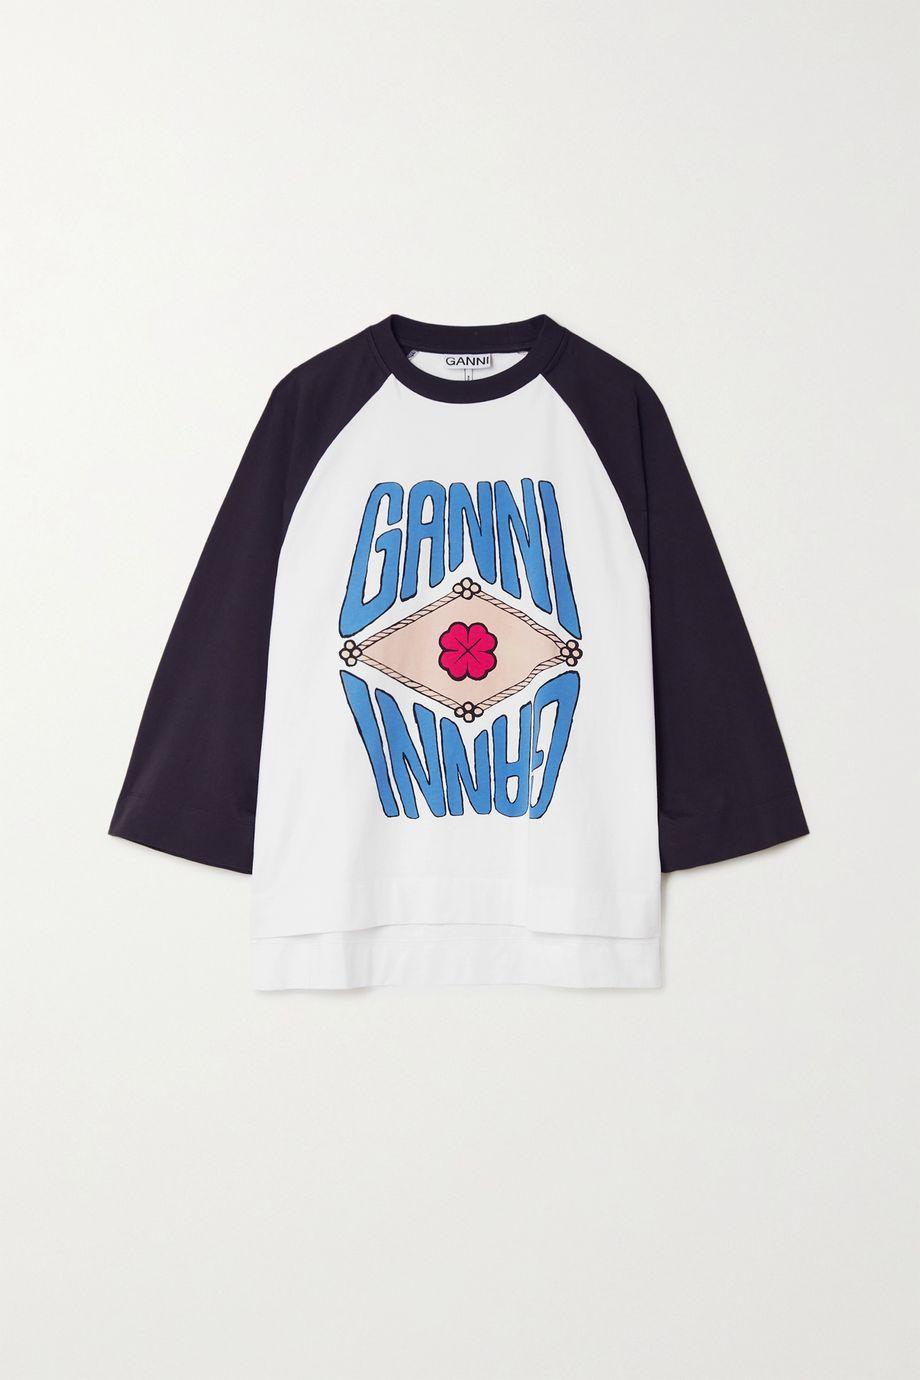 GANNI + NET SUSTAIN printed organic cotton-jersey top